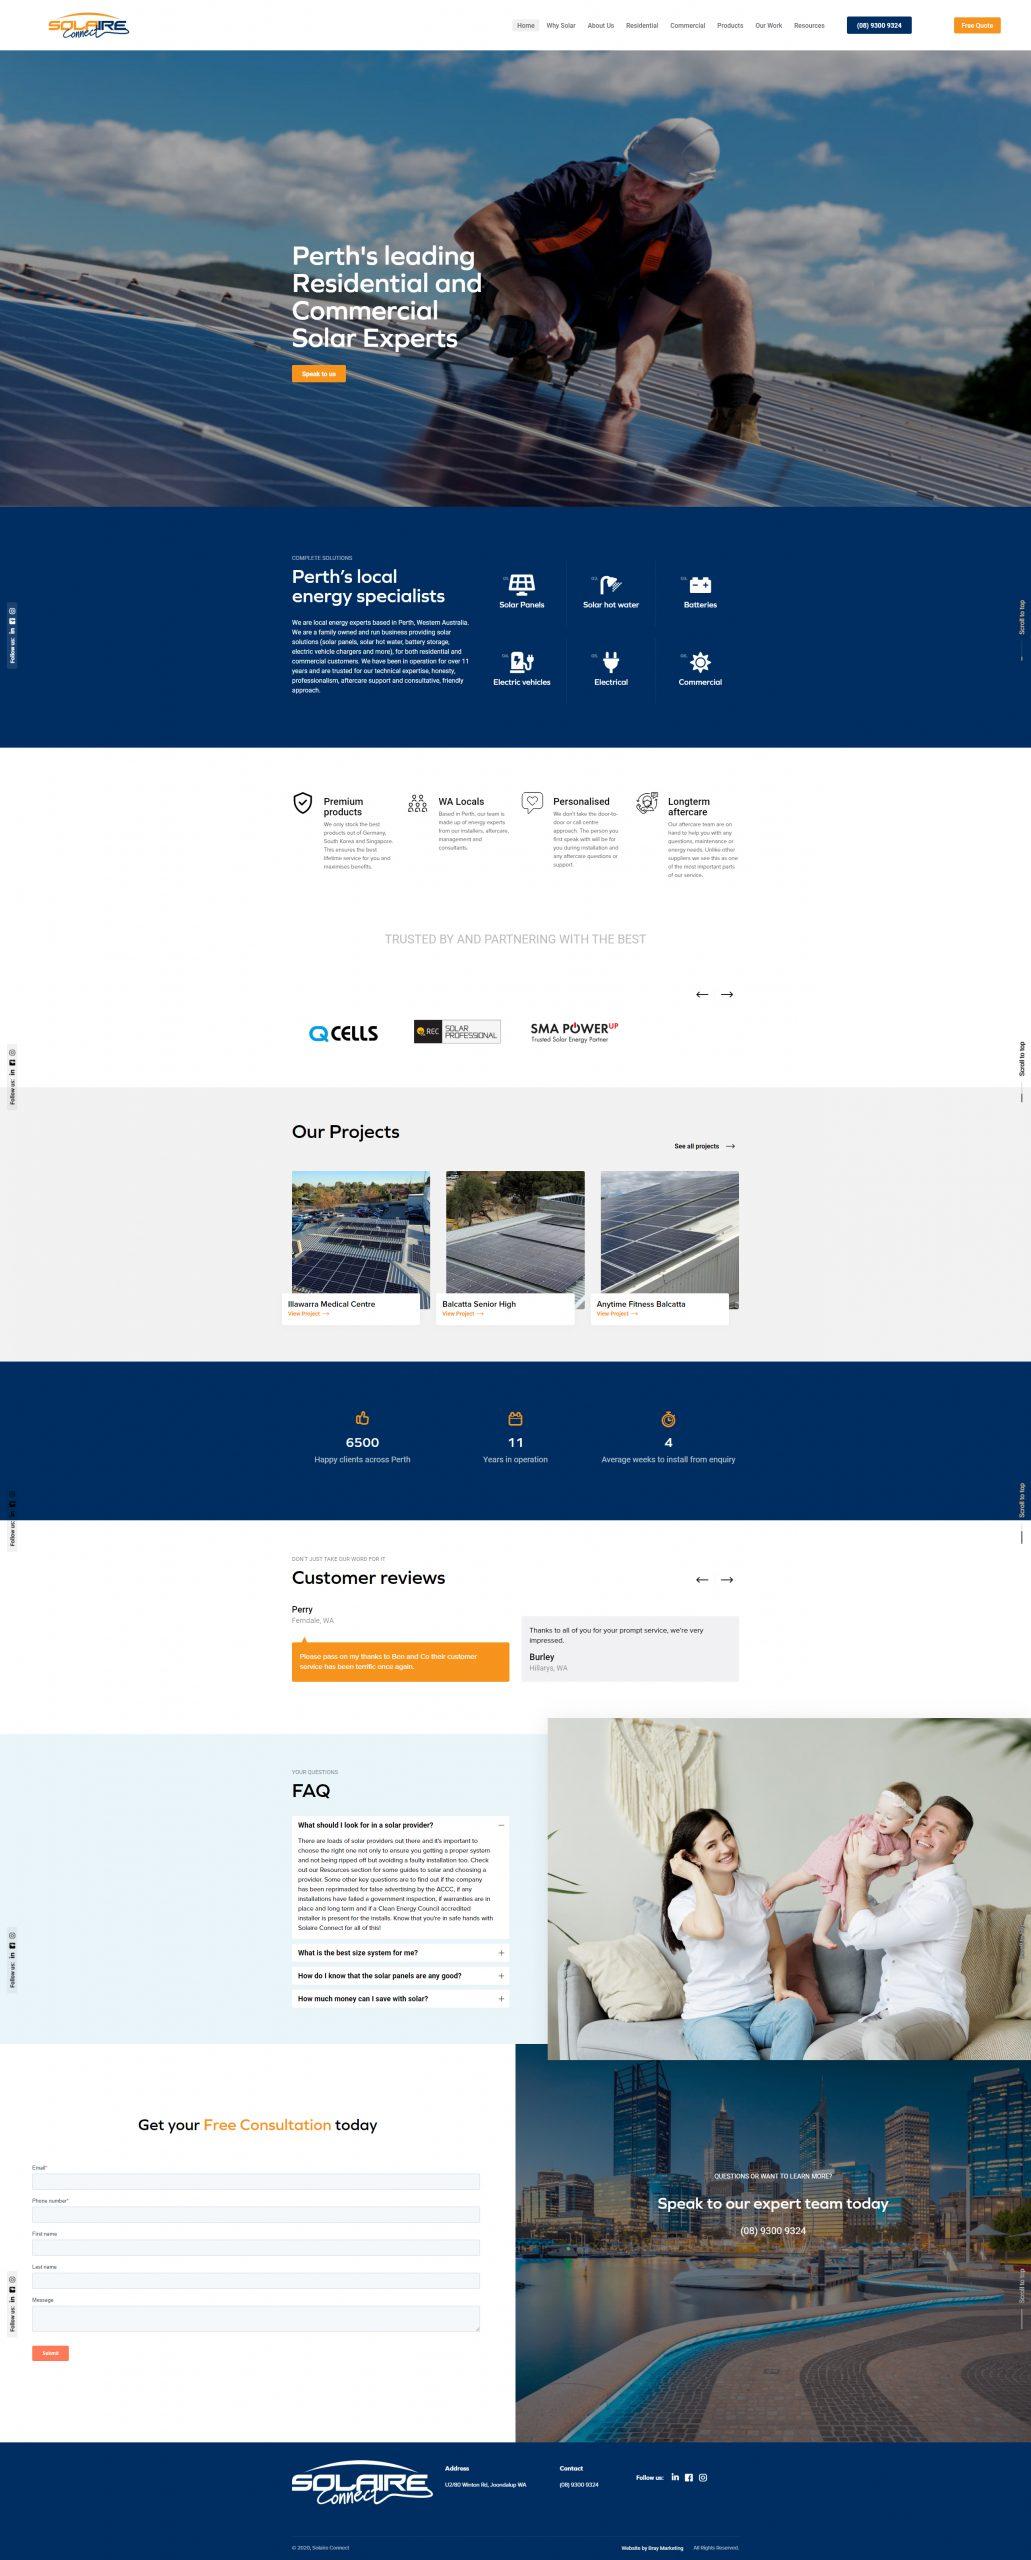 Solaire Connect Website Home- Bray Marketing - Web Design Perth - Marketing Perth